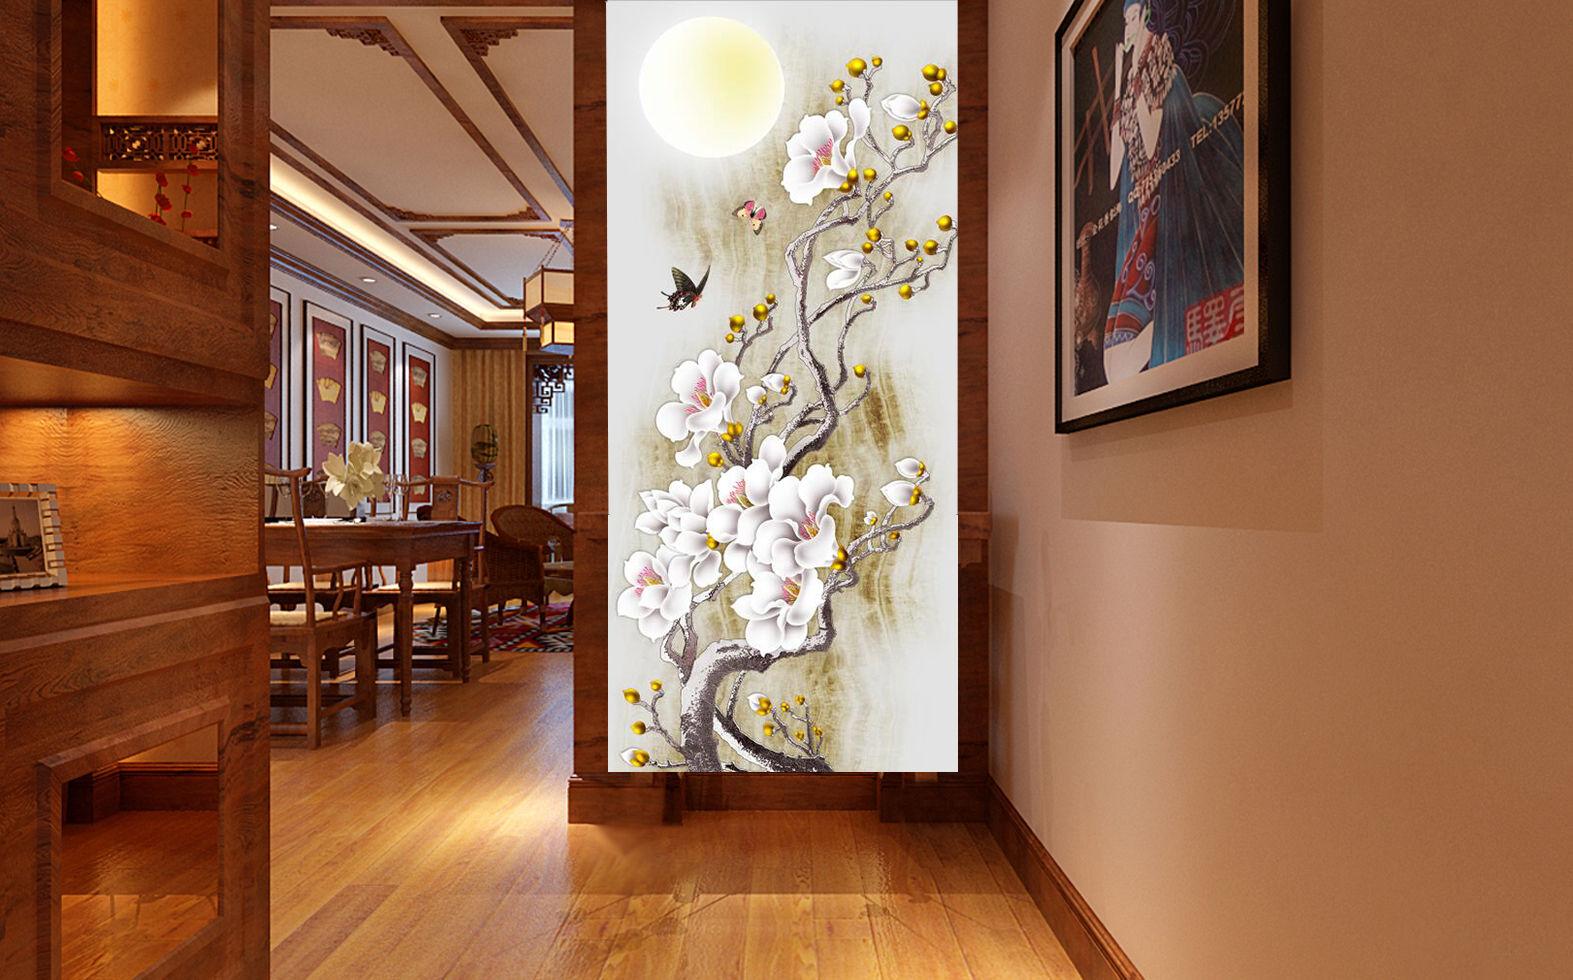 3D Flowers Moonlight Wall Paper Wall Print Decal Wall Deco Indoor wall Murals